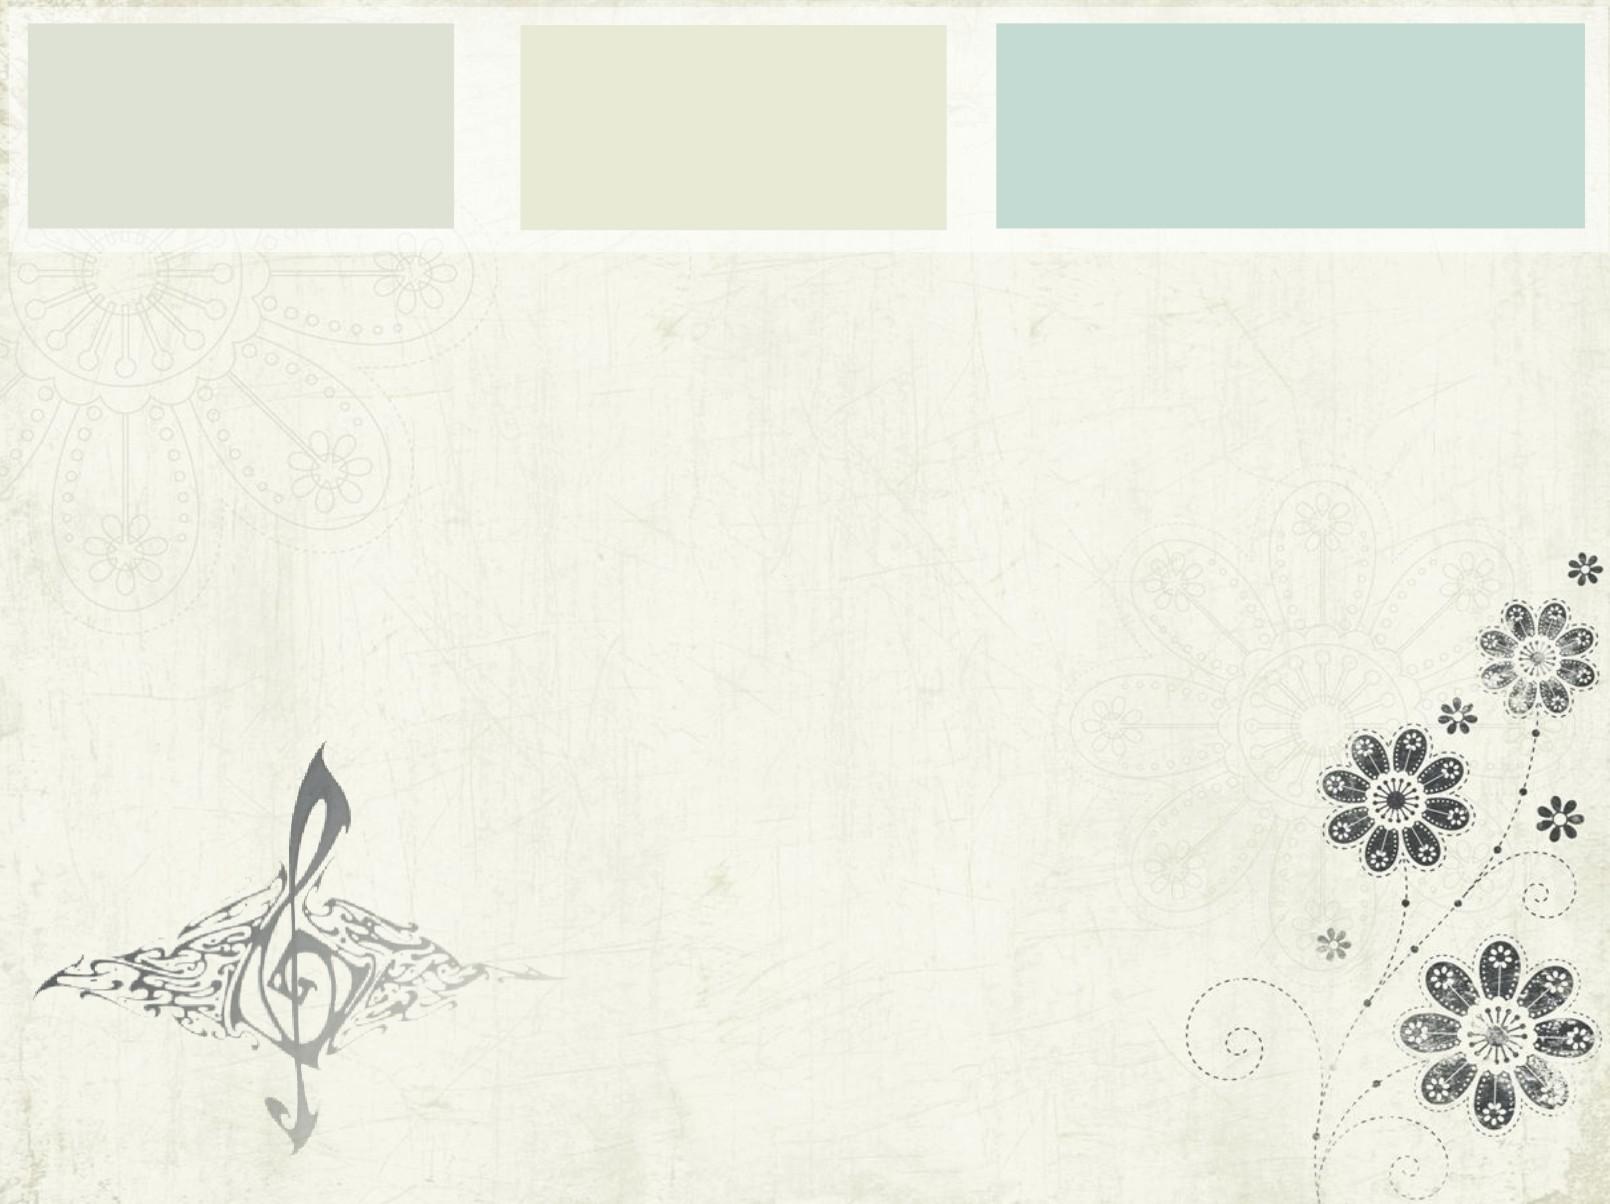 Floral design for music